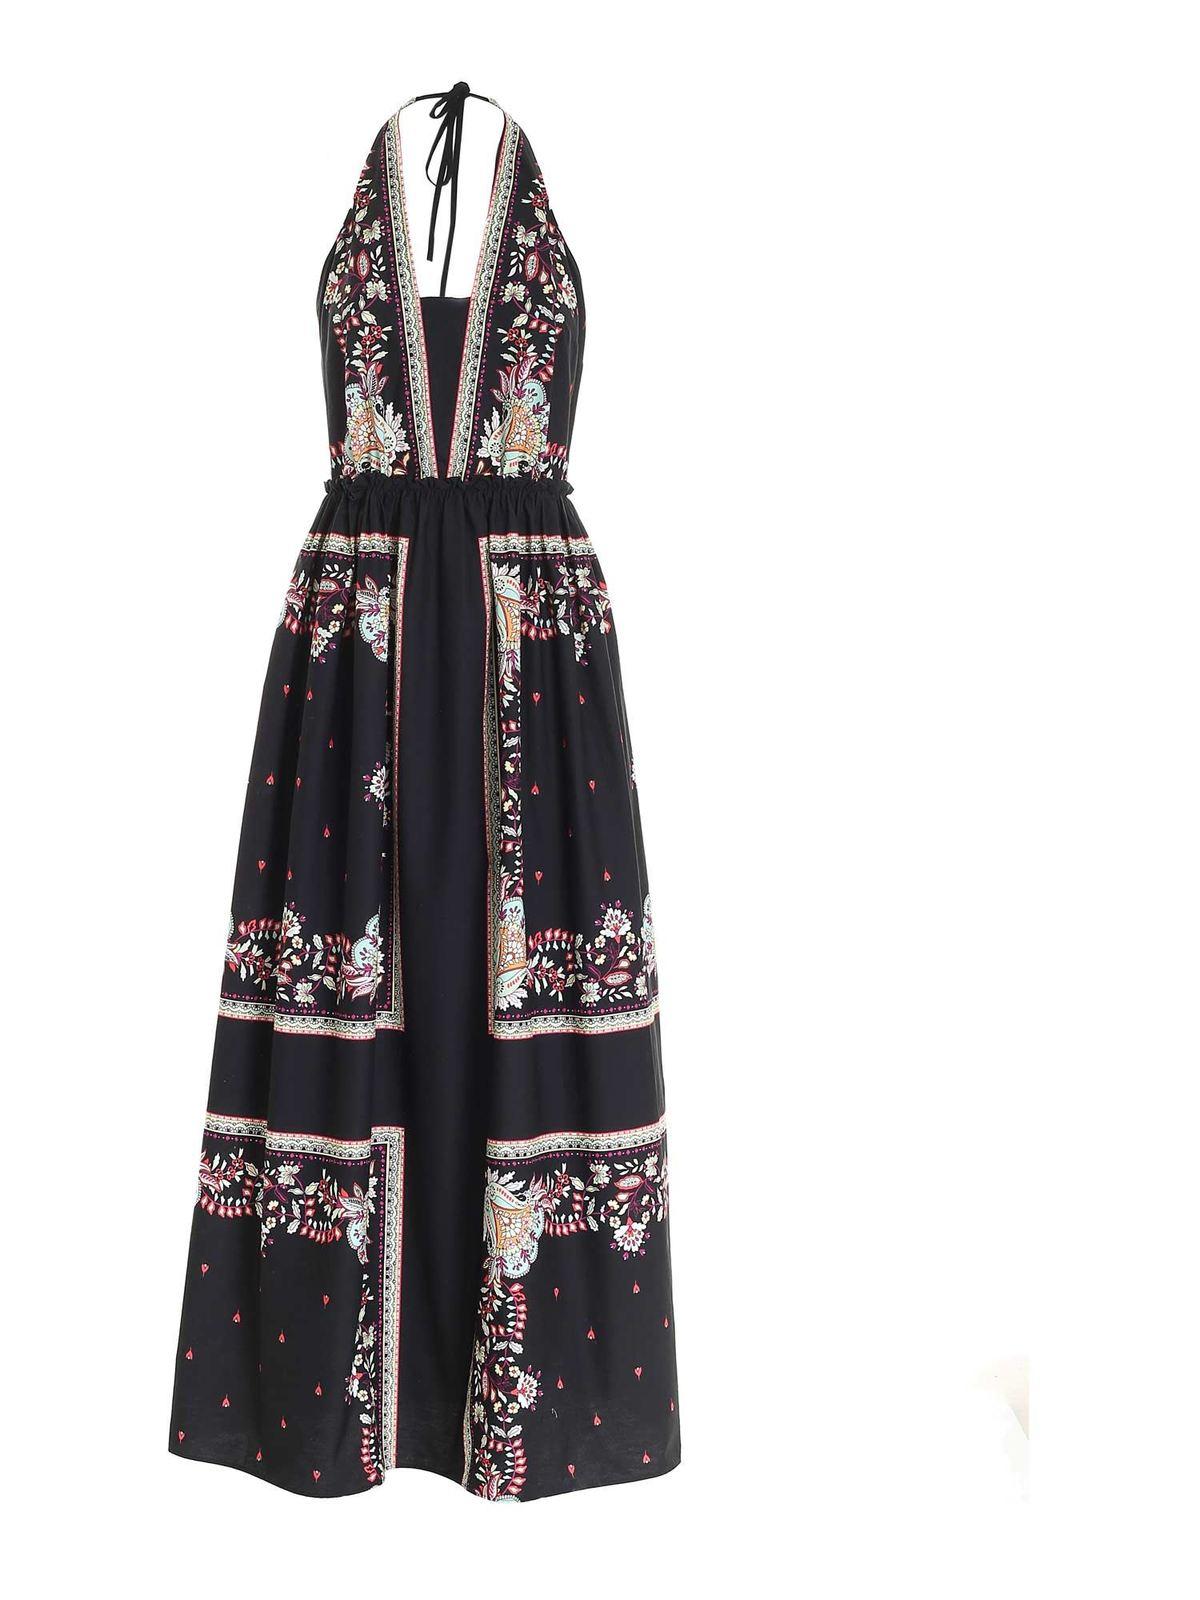 Twinset FLORAL PRINT DRESS IN BLACK